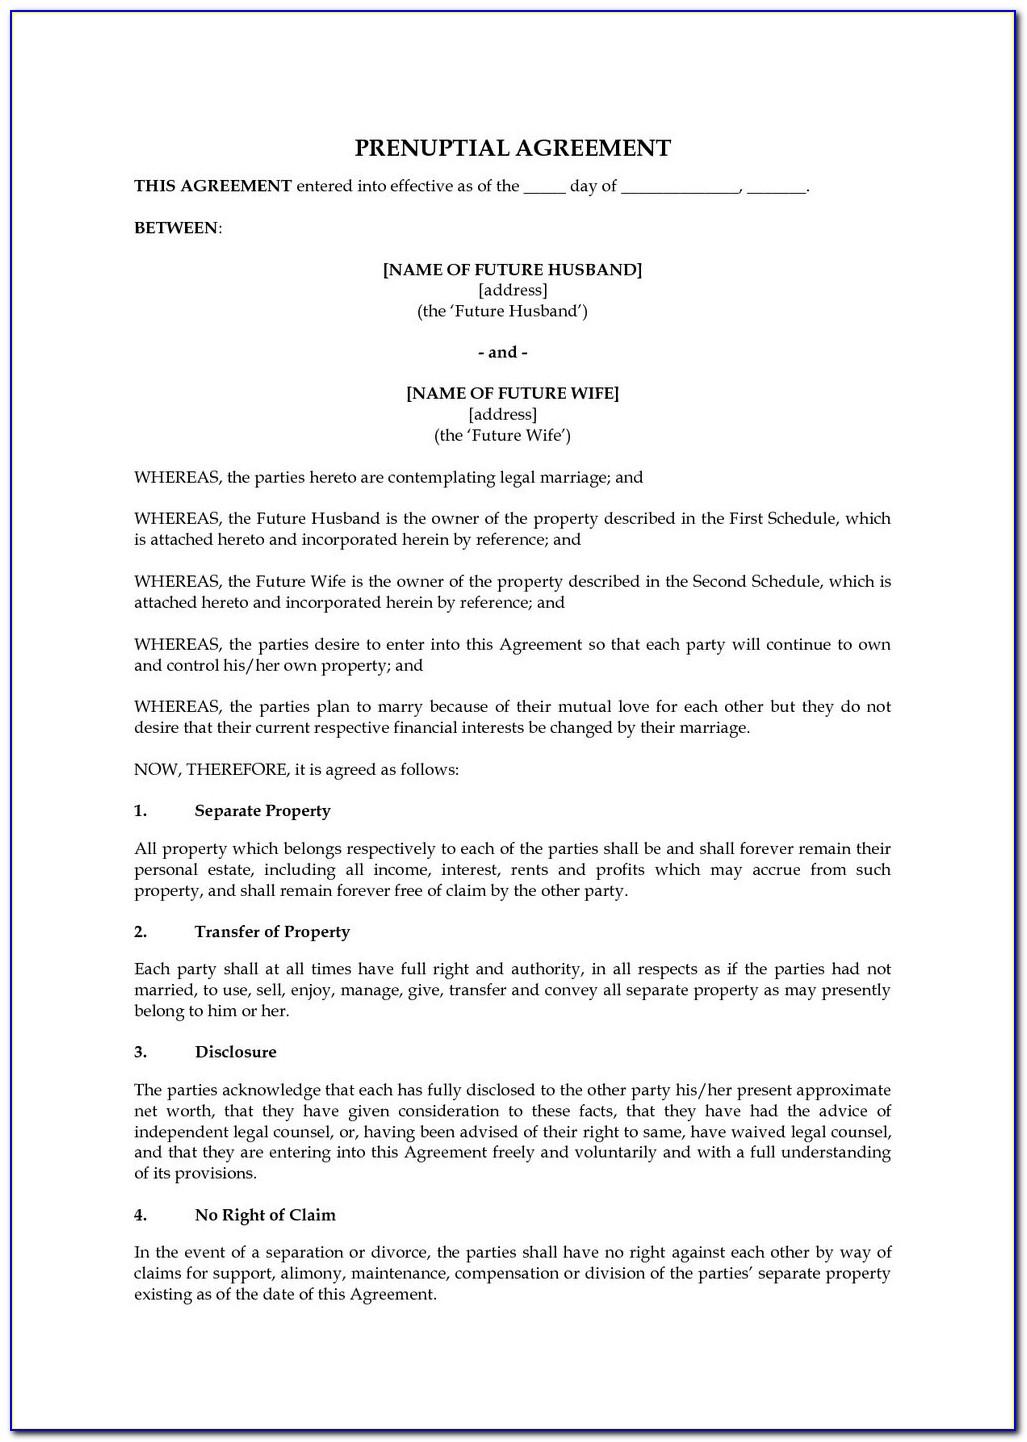 Prenuptial Agreement Example